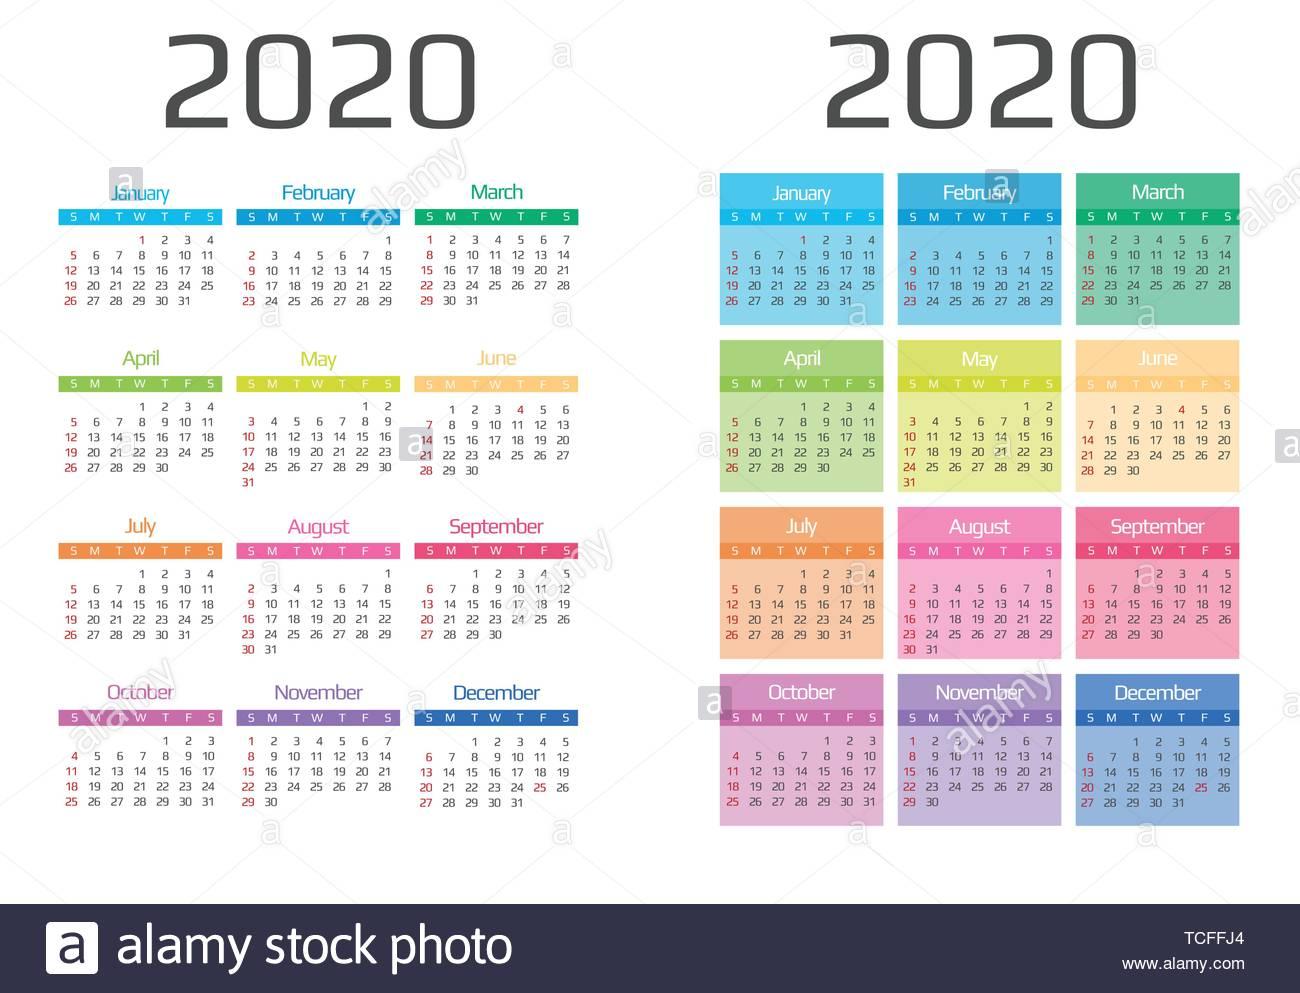 Event Calendar 2020 Calendar 2020 template.12 Months include holiday event Stock